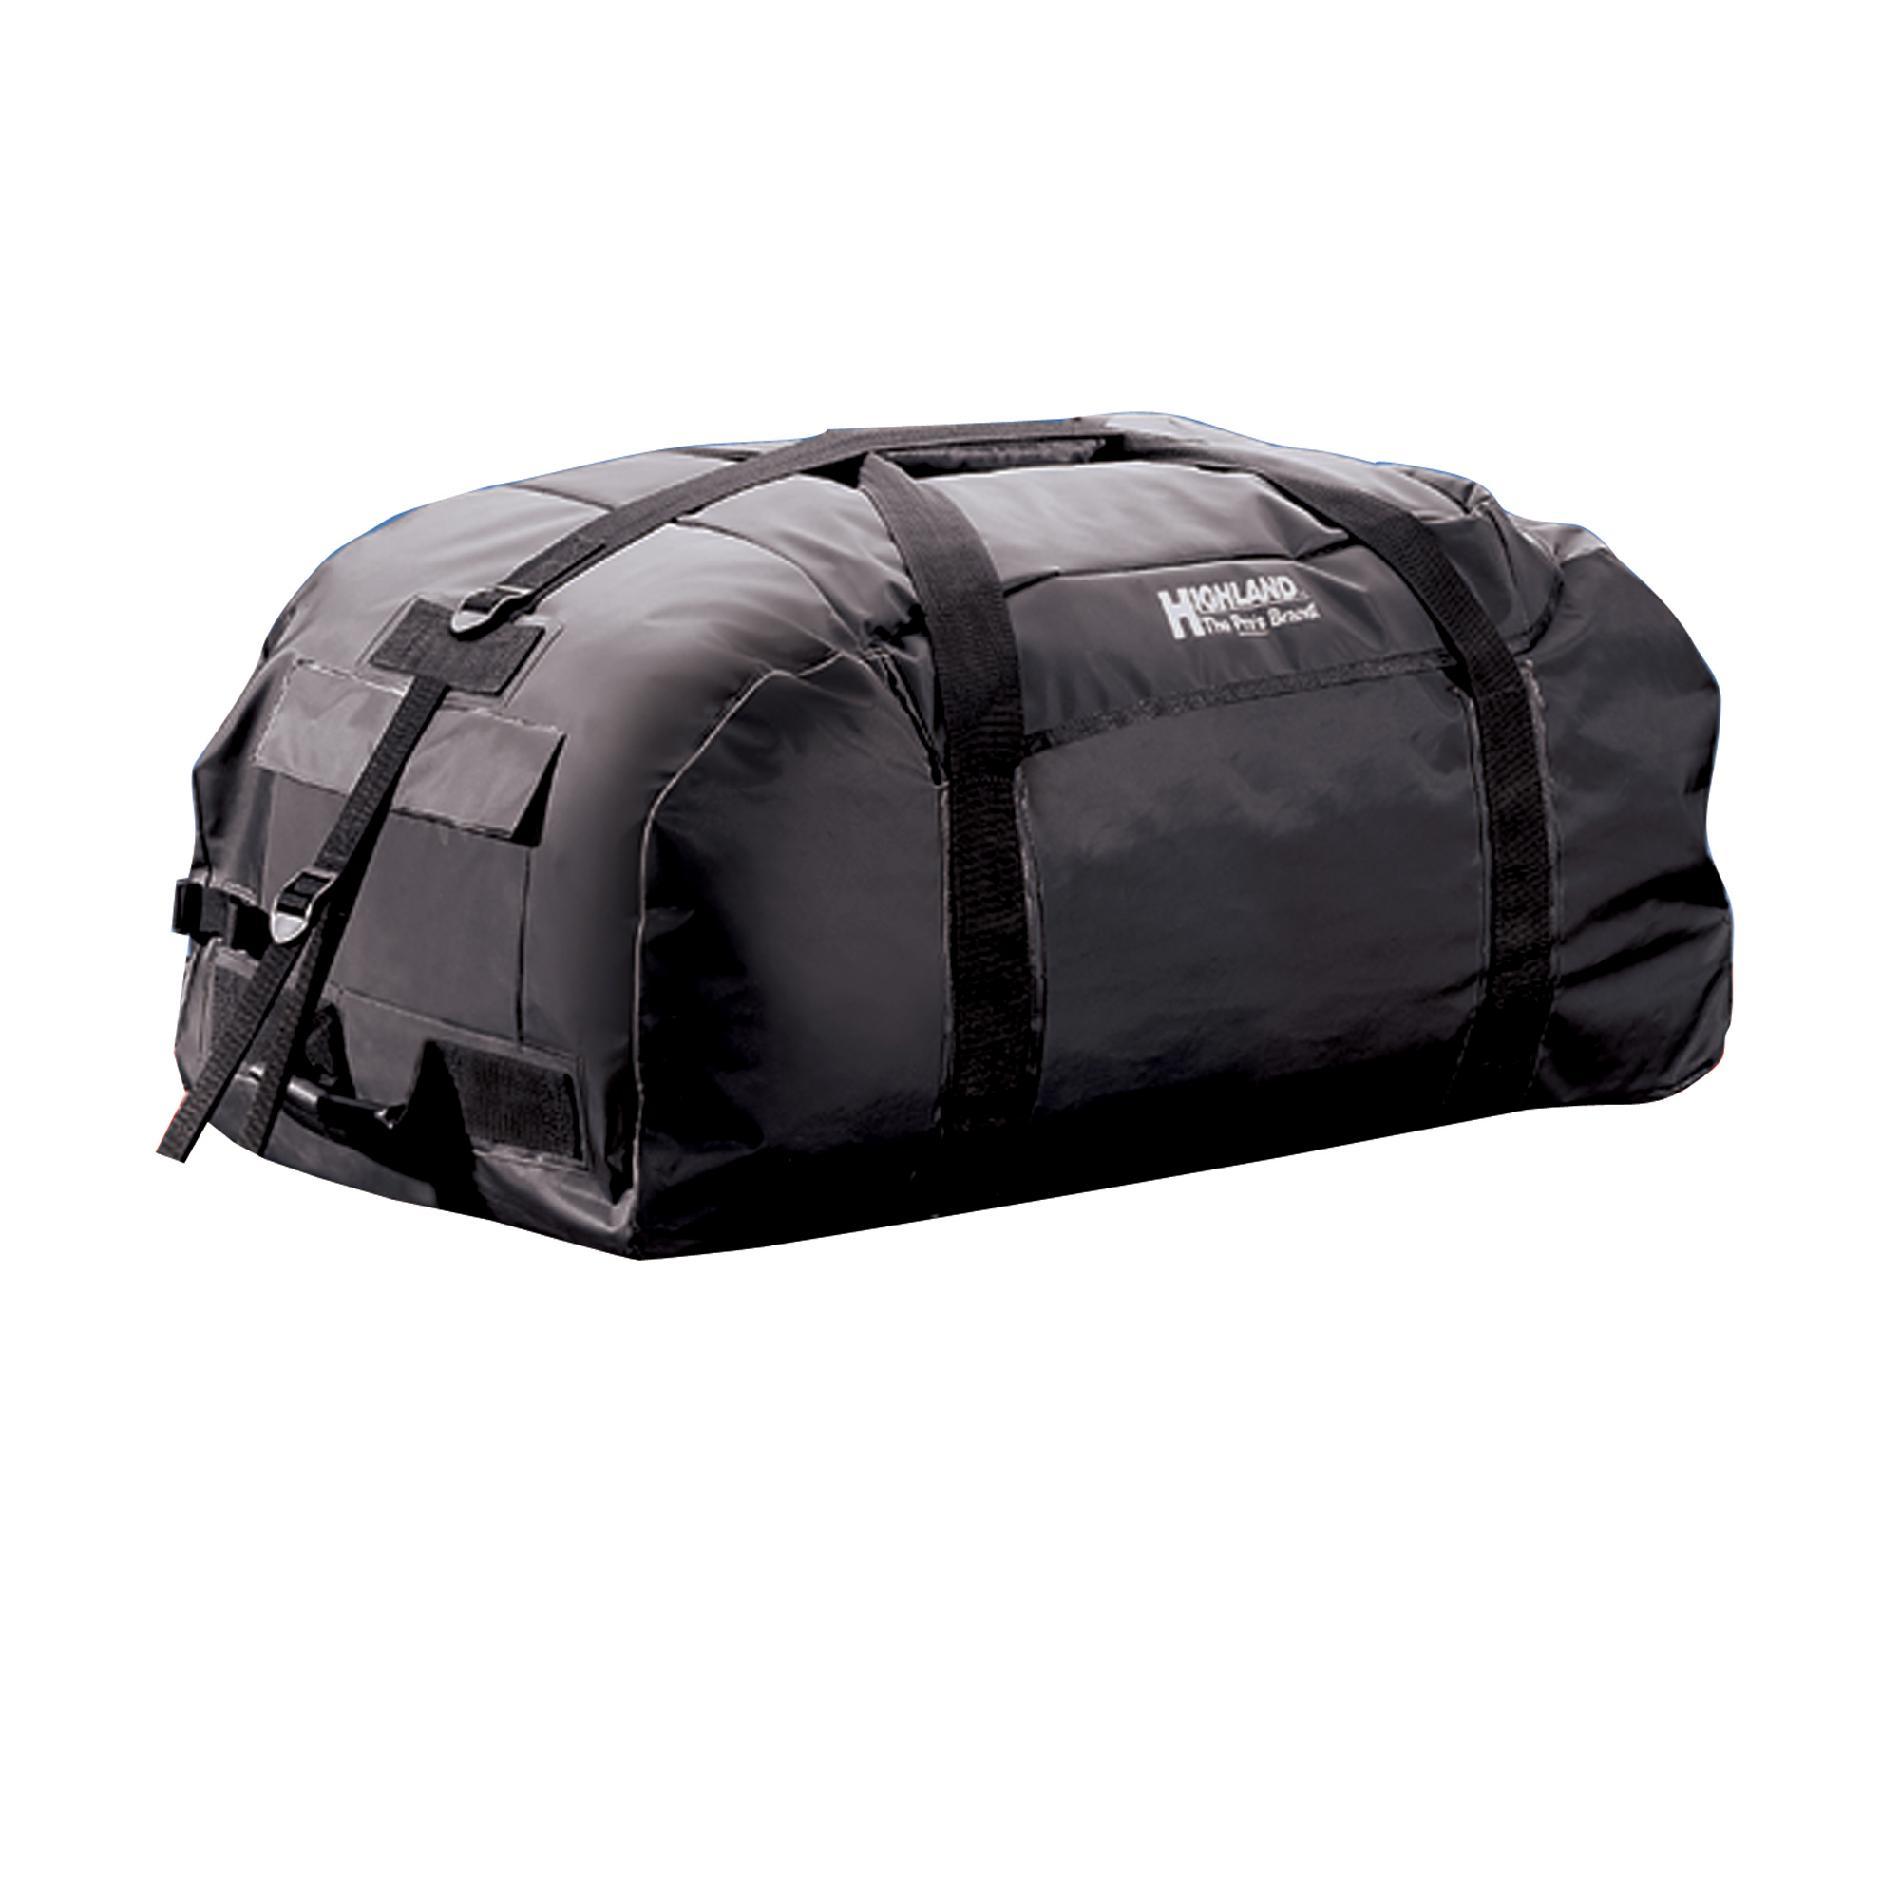 Highland Car Top Luggage Waterpr00f Rollng Duffel Bag - Automotive Exterior Accessories